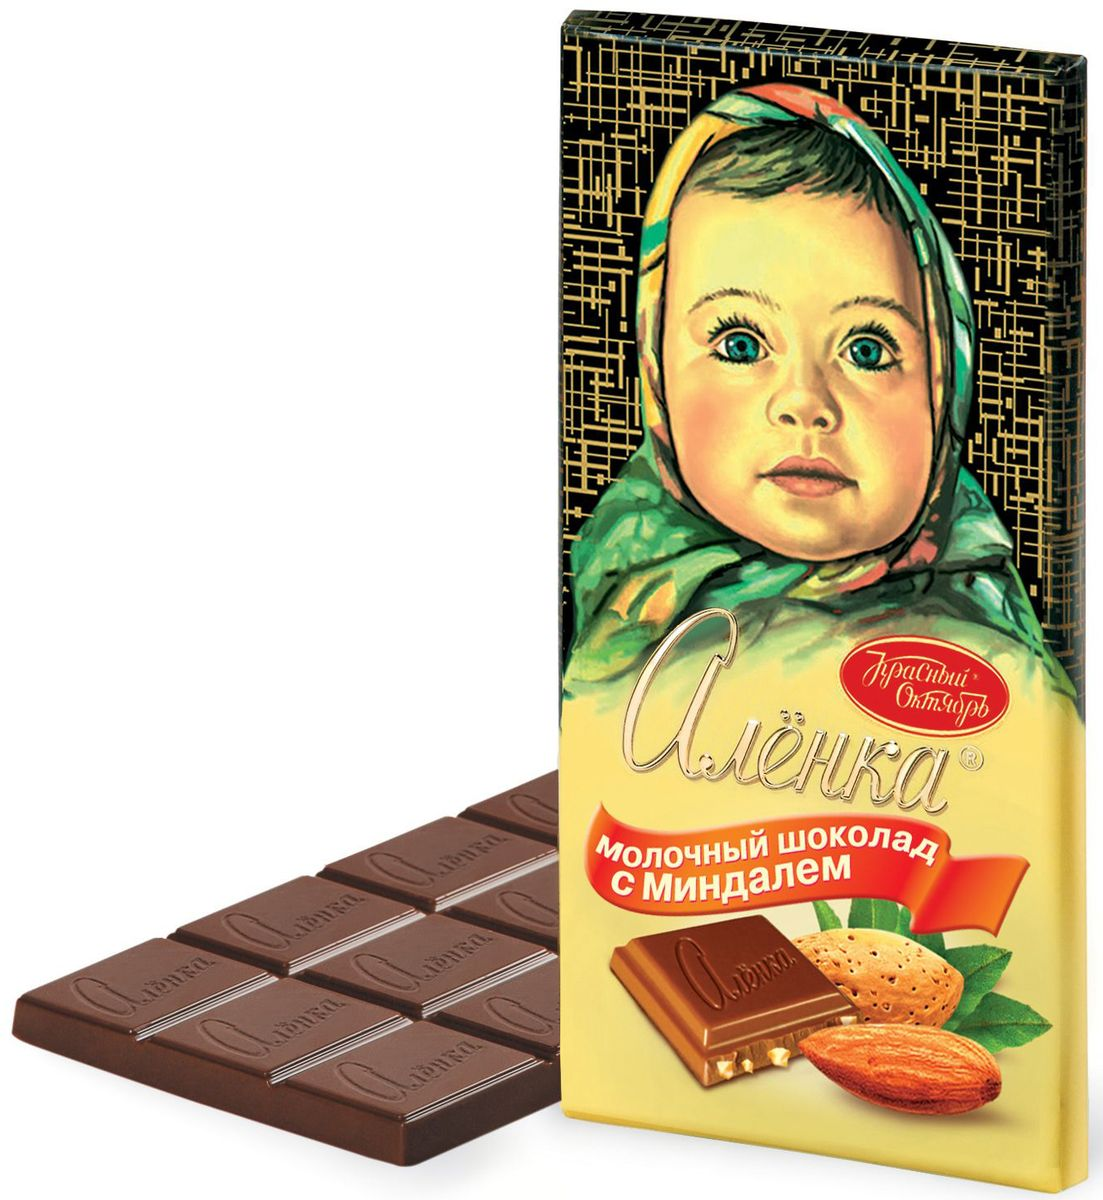 Красный Октябрь Аленка с миндалем молочный шоколад, 100 г